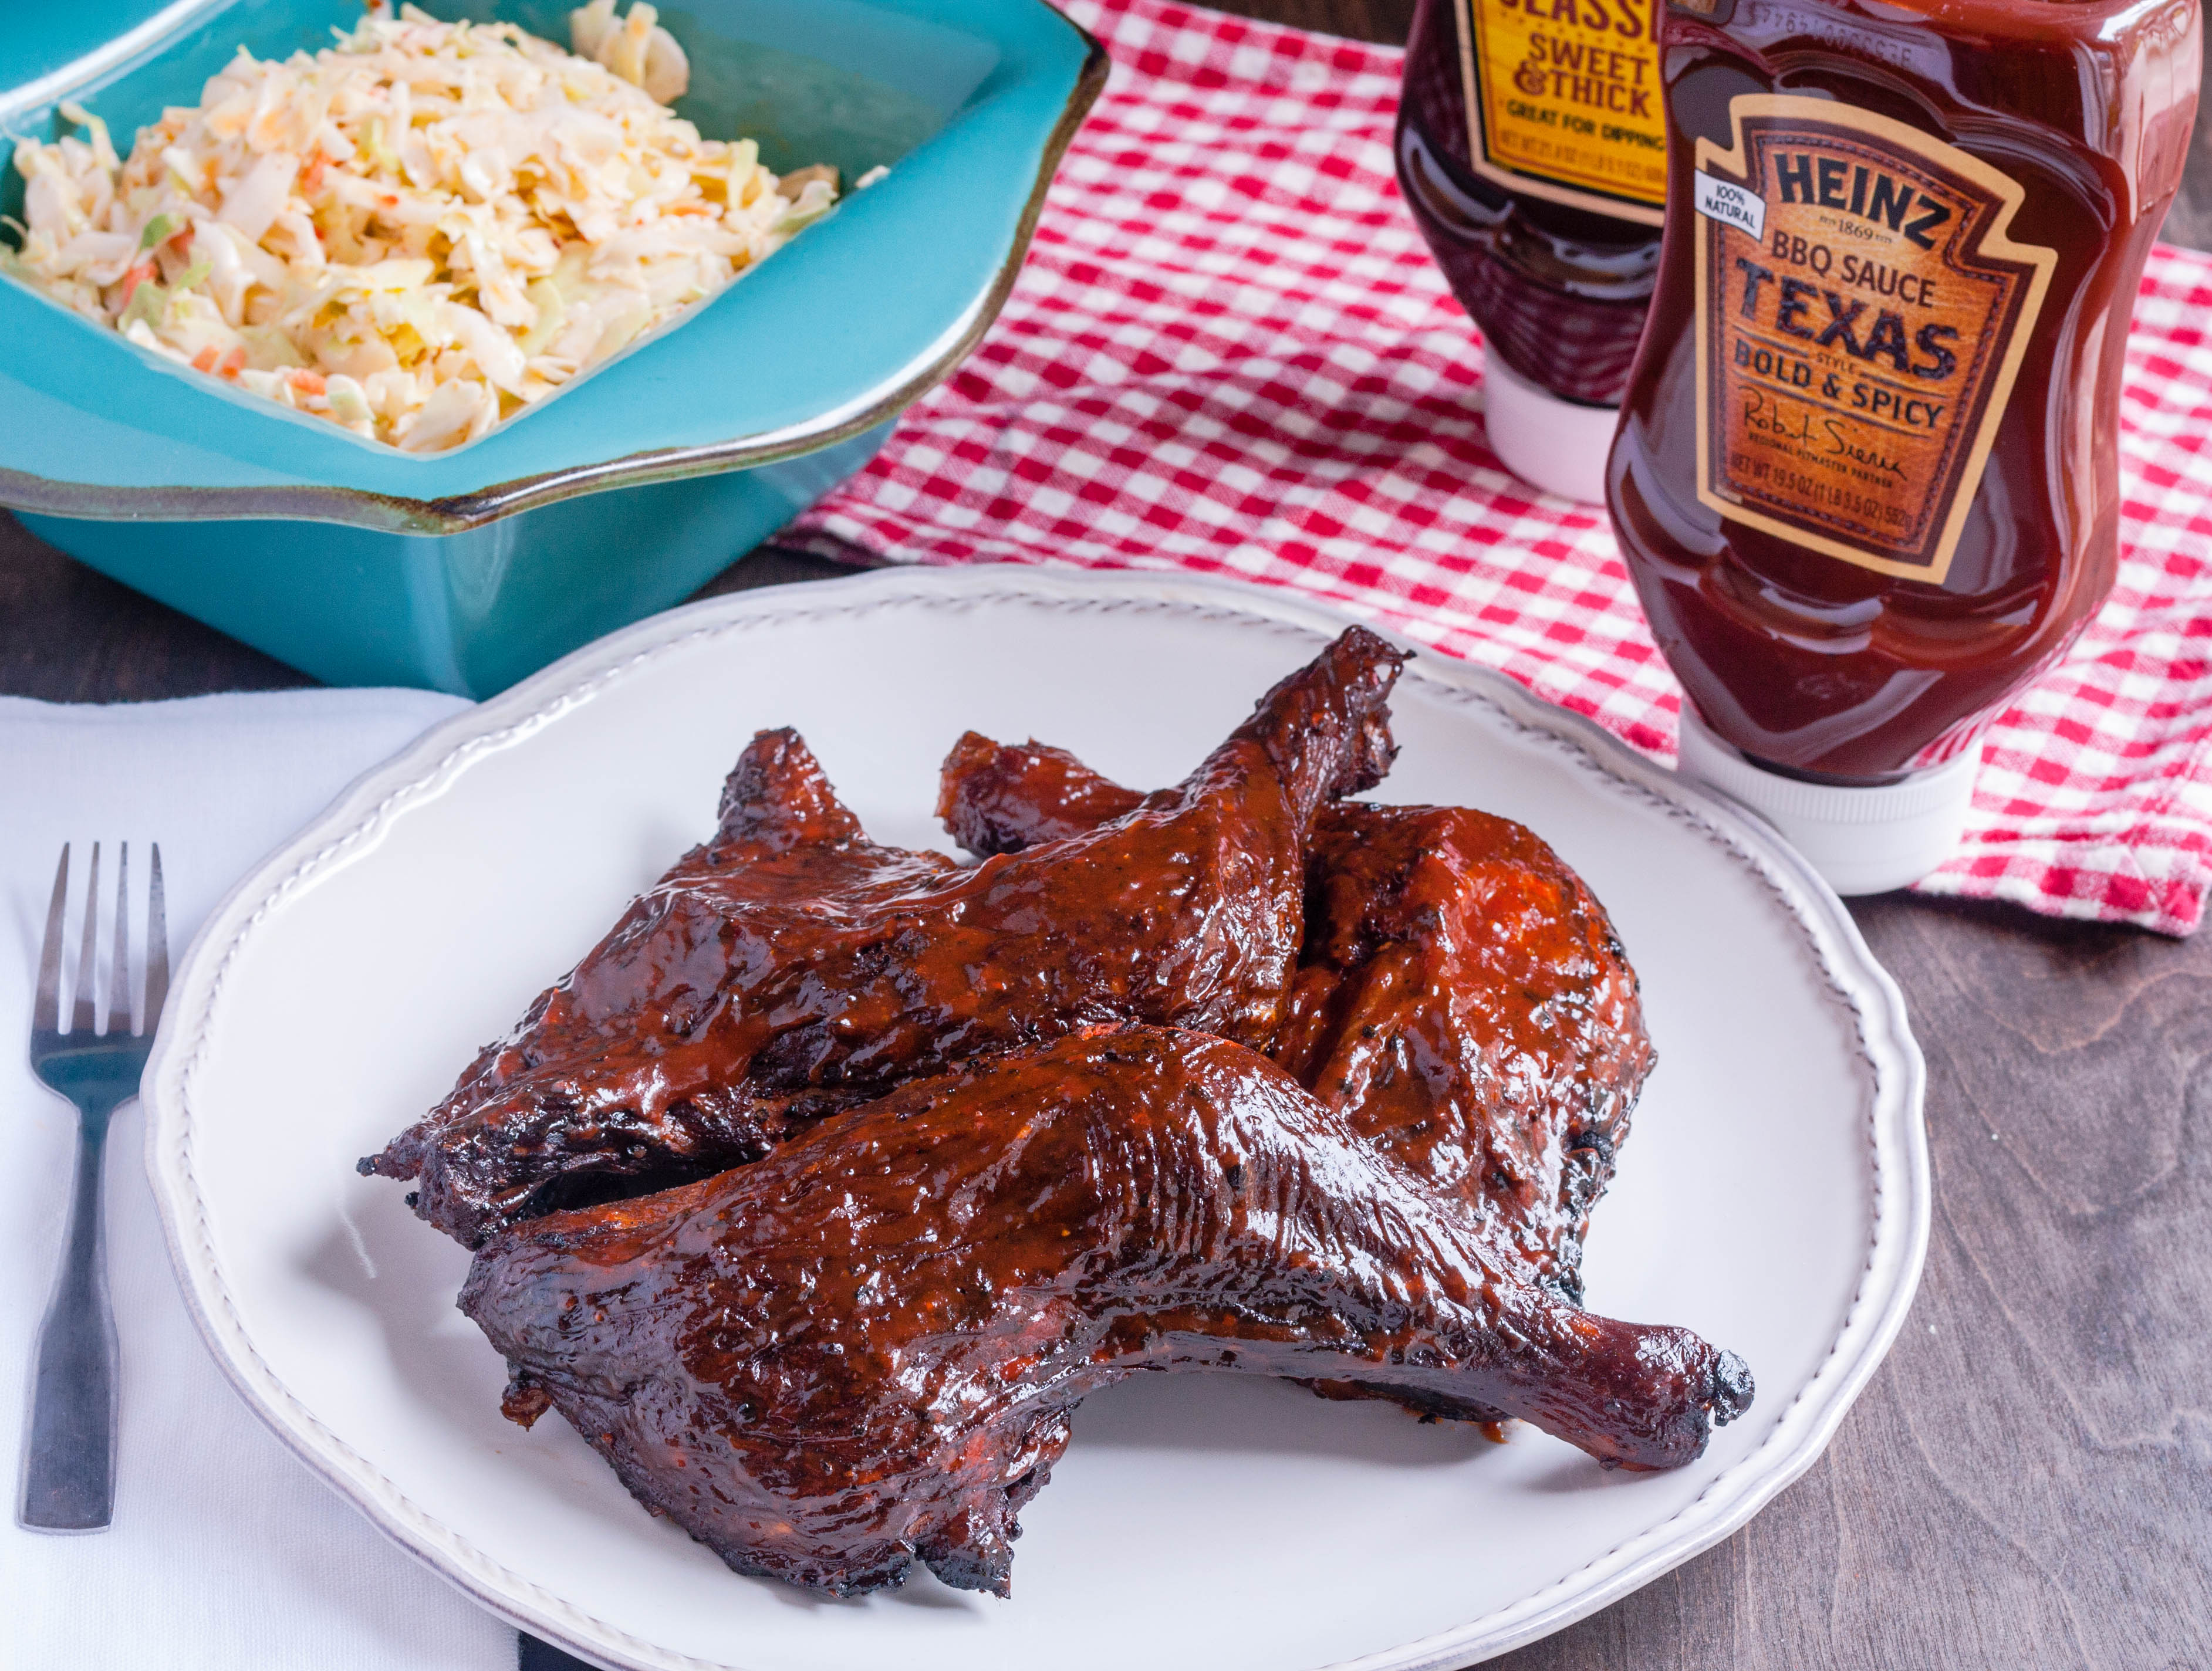 Smoked Chicken Leg Quarters With Heinz Bbq Texas Bold Amp Spicy Bbq Sauce Jennifer Cooks